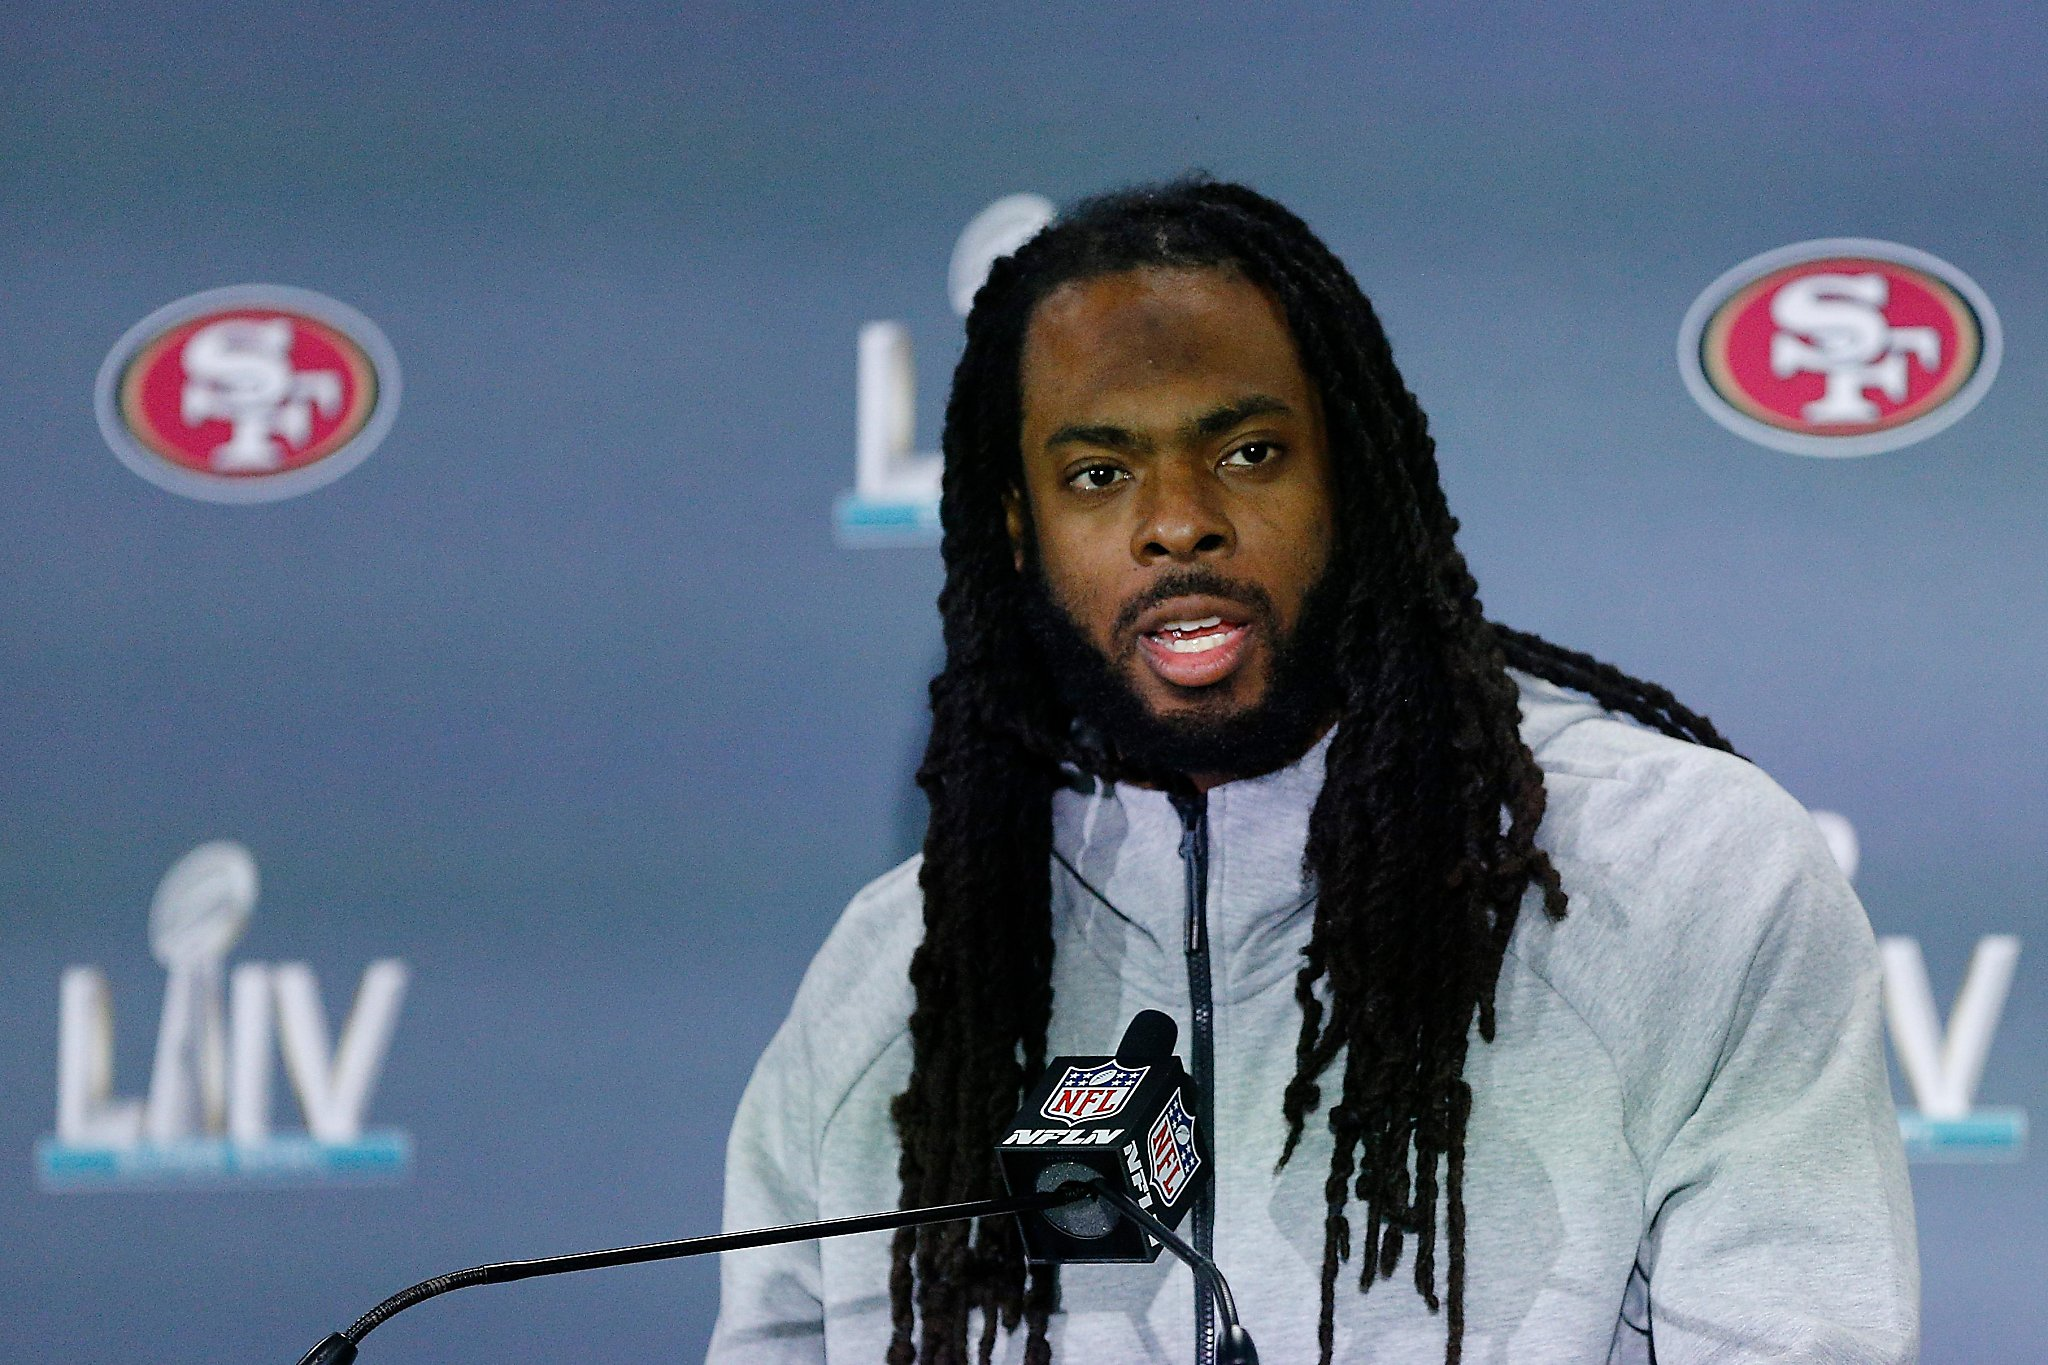 49ers' Richard Sherman not happy about latest 'random' NFL drug test